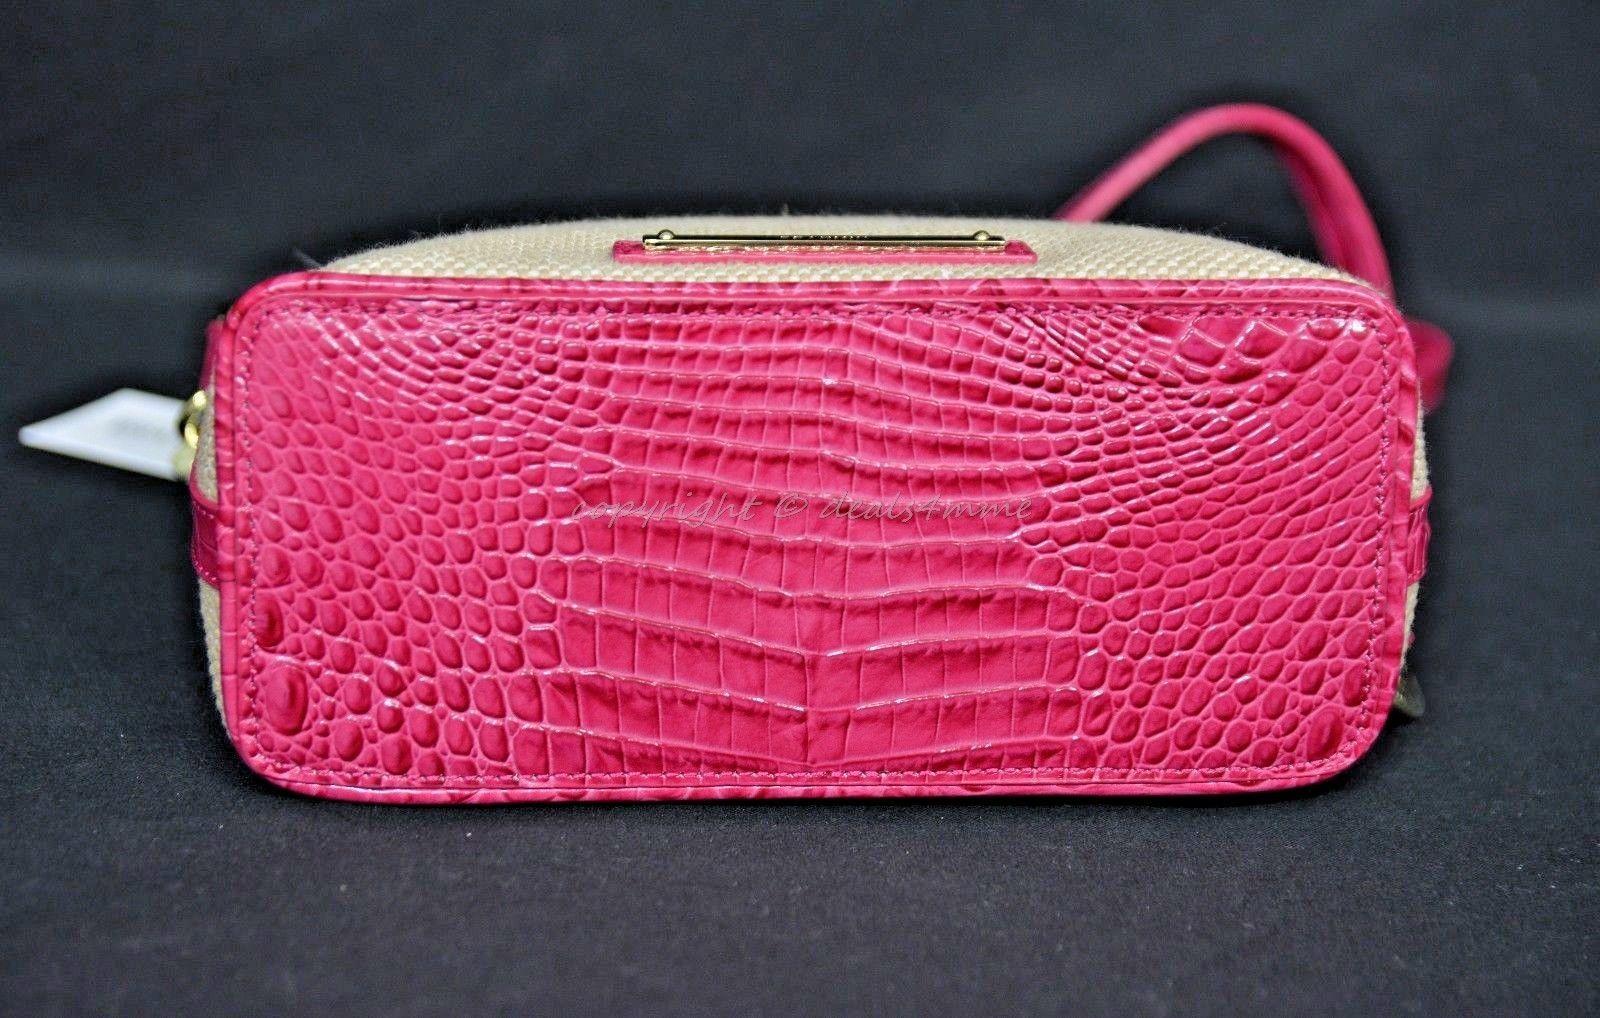 NWT Brahmin Mini Duxbury Shoulder Bag in Punch Harbor, Pink Leather/Beige Fabric image 11